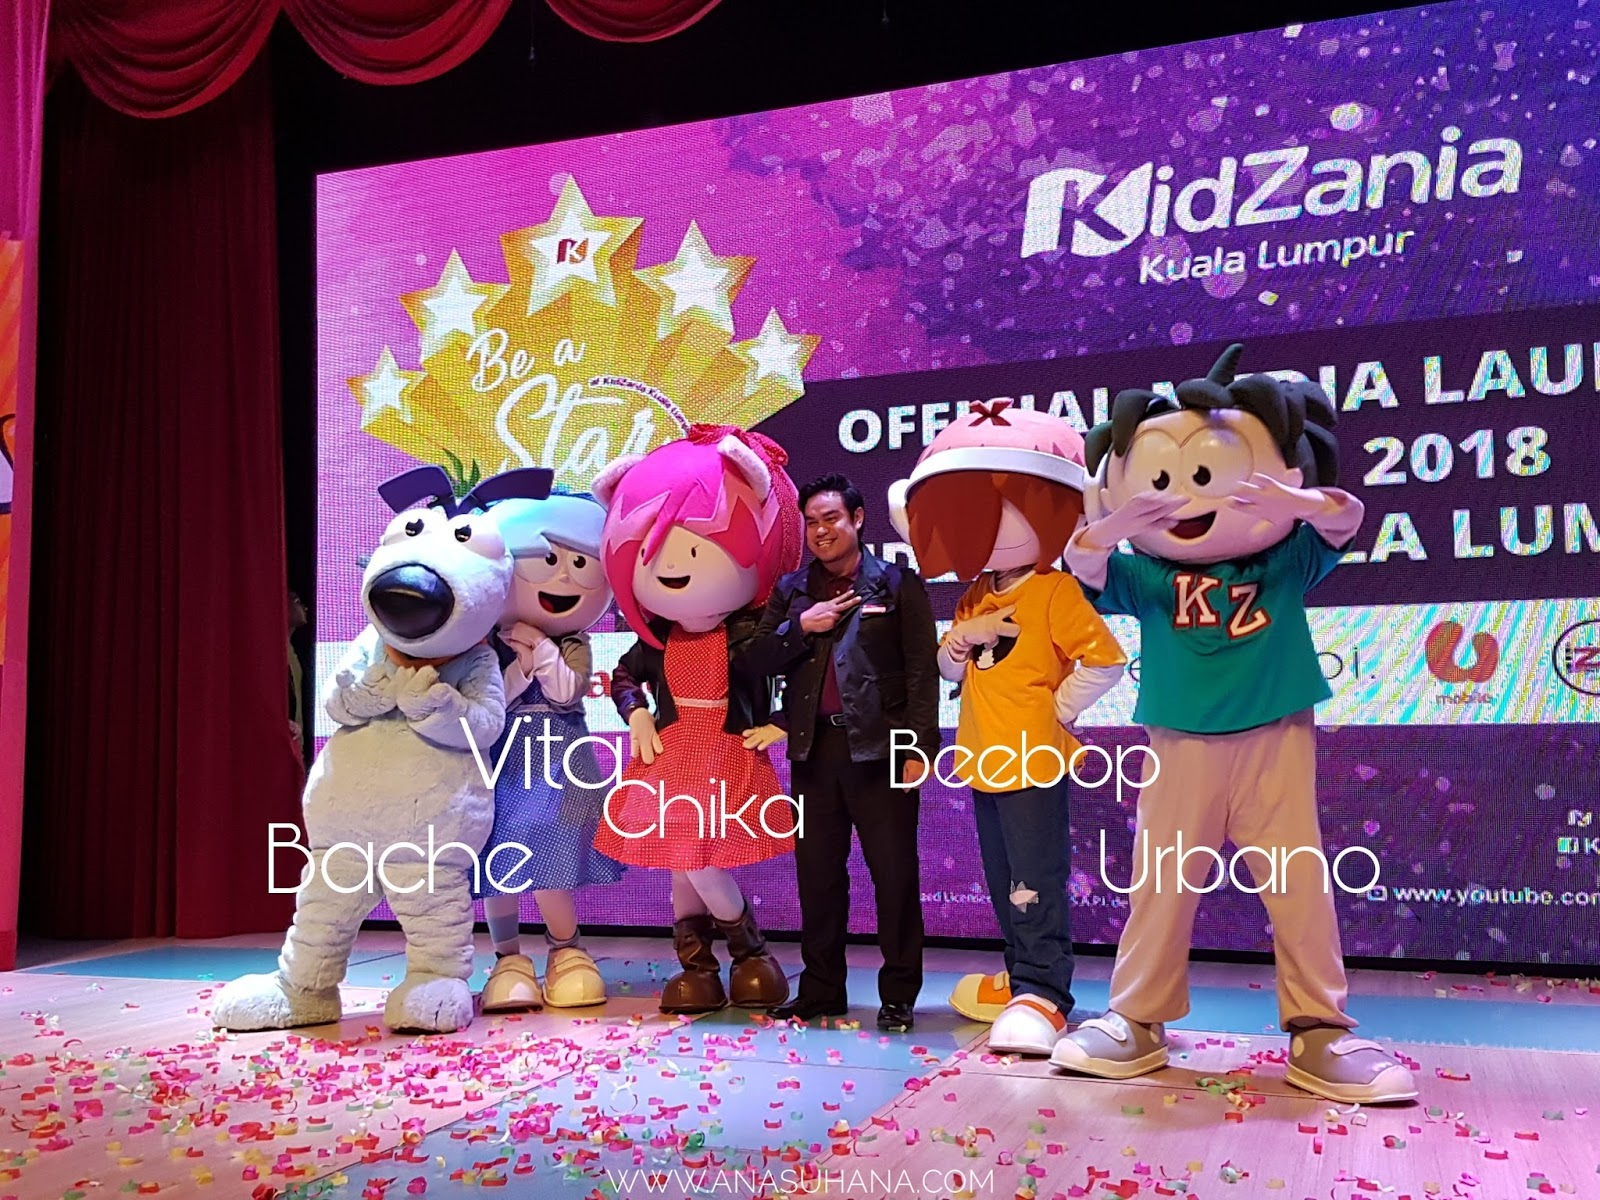 Be A Star KidZania Kuala Lumpur